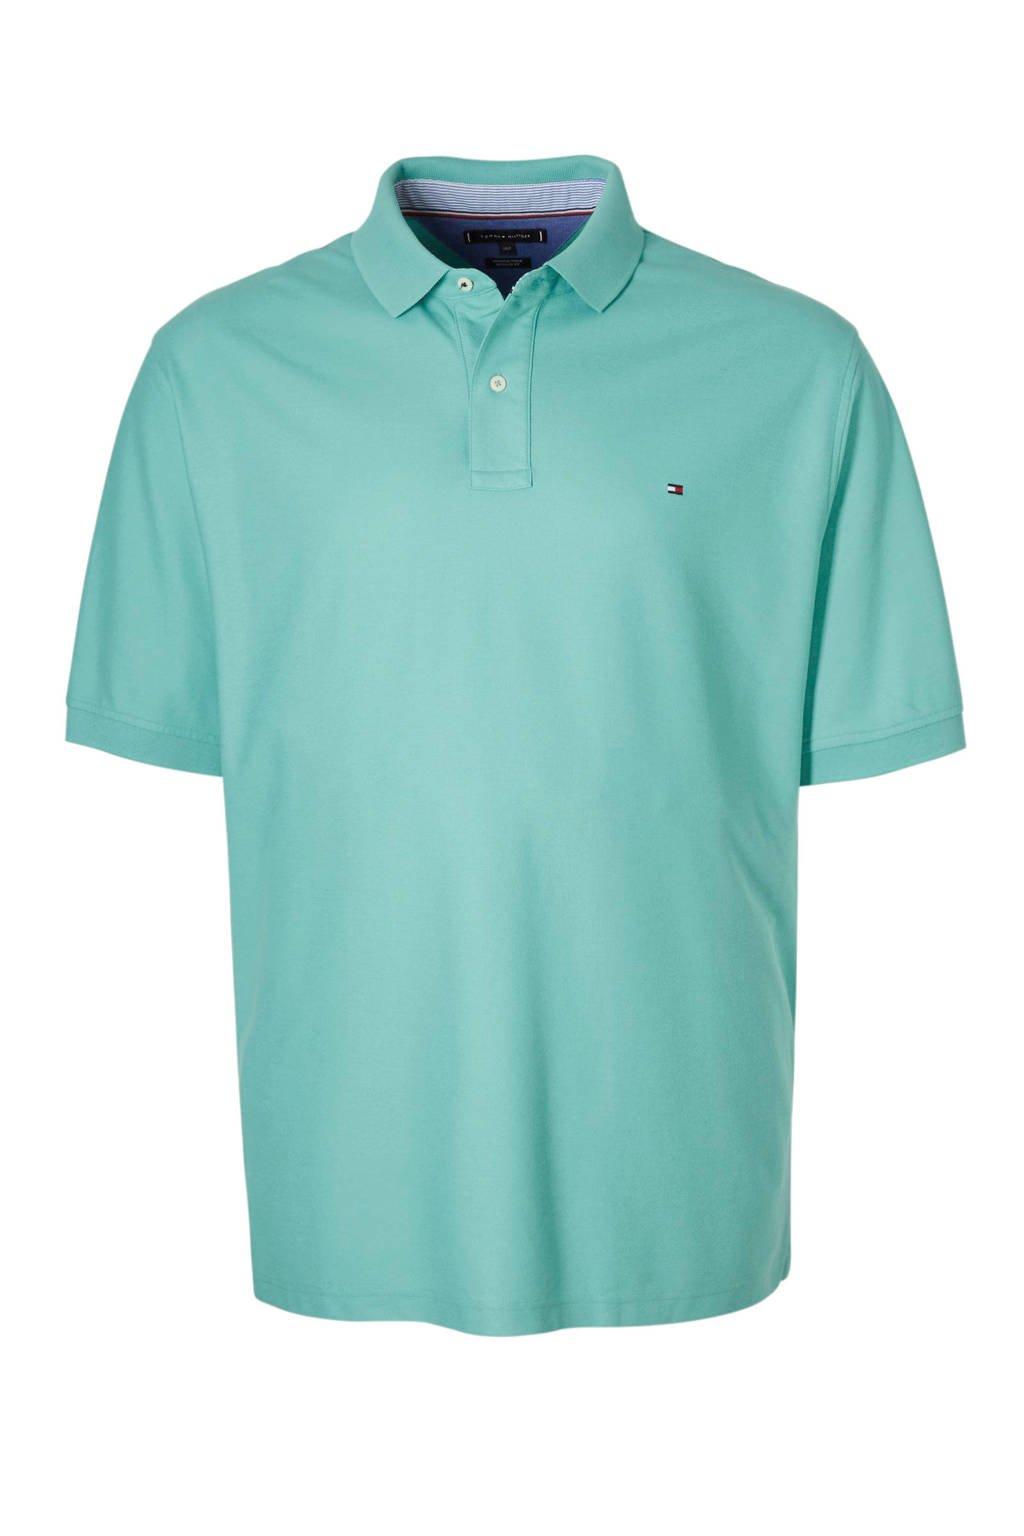 Tommy Hilfiger Big & Tall +size polo met logo, Blauw